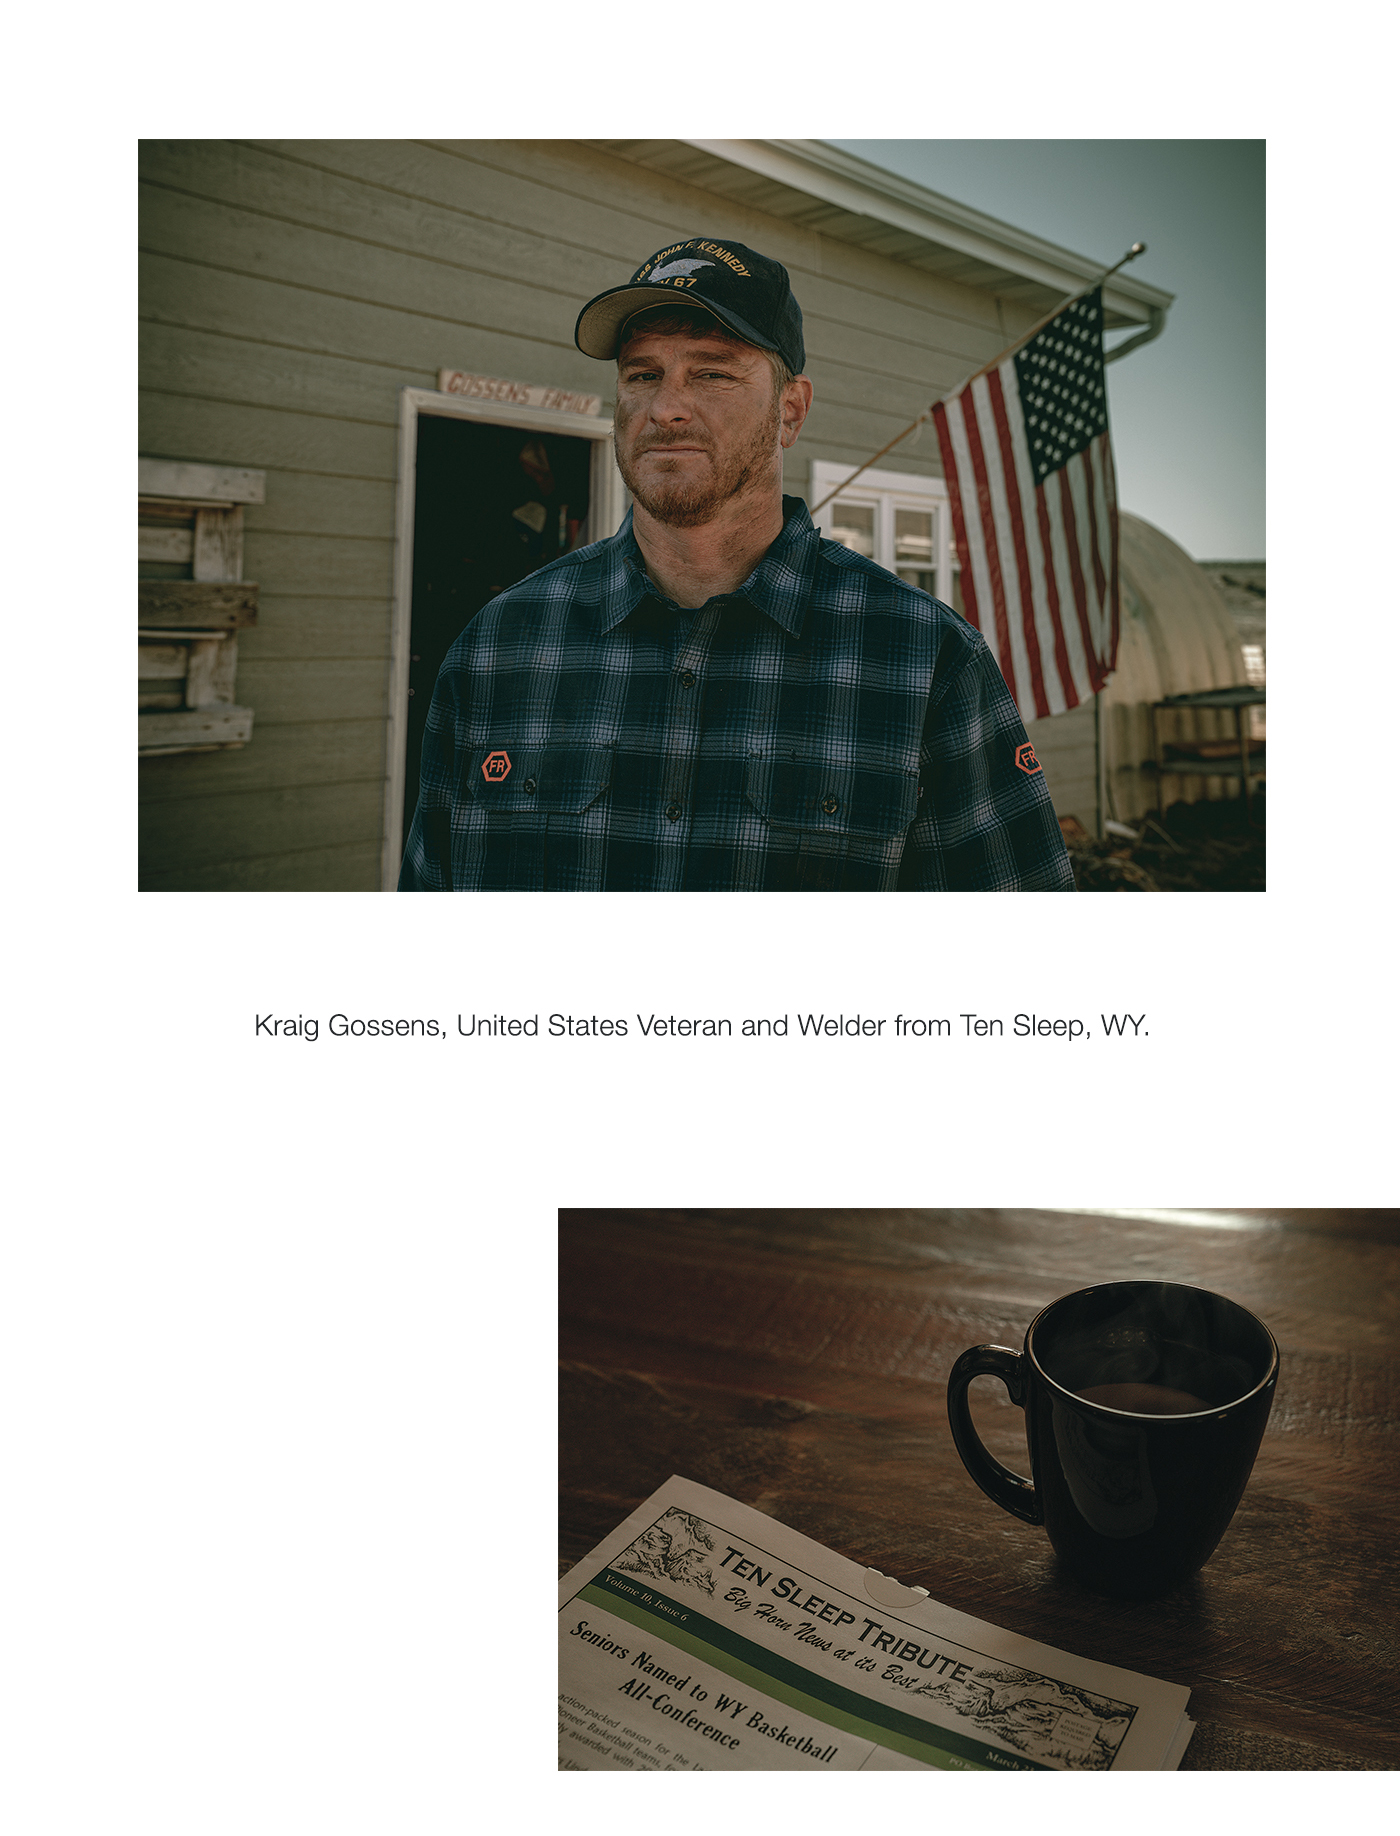 Heart Of America Lookbook - Shop Now